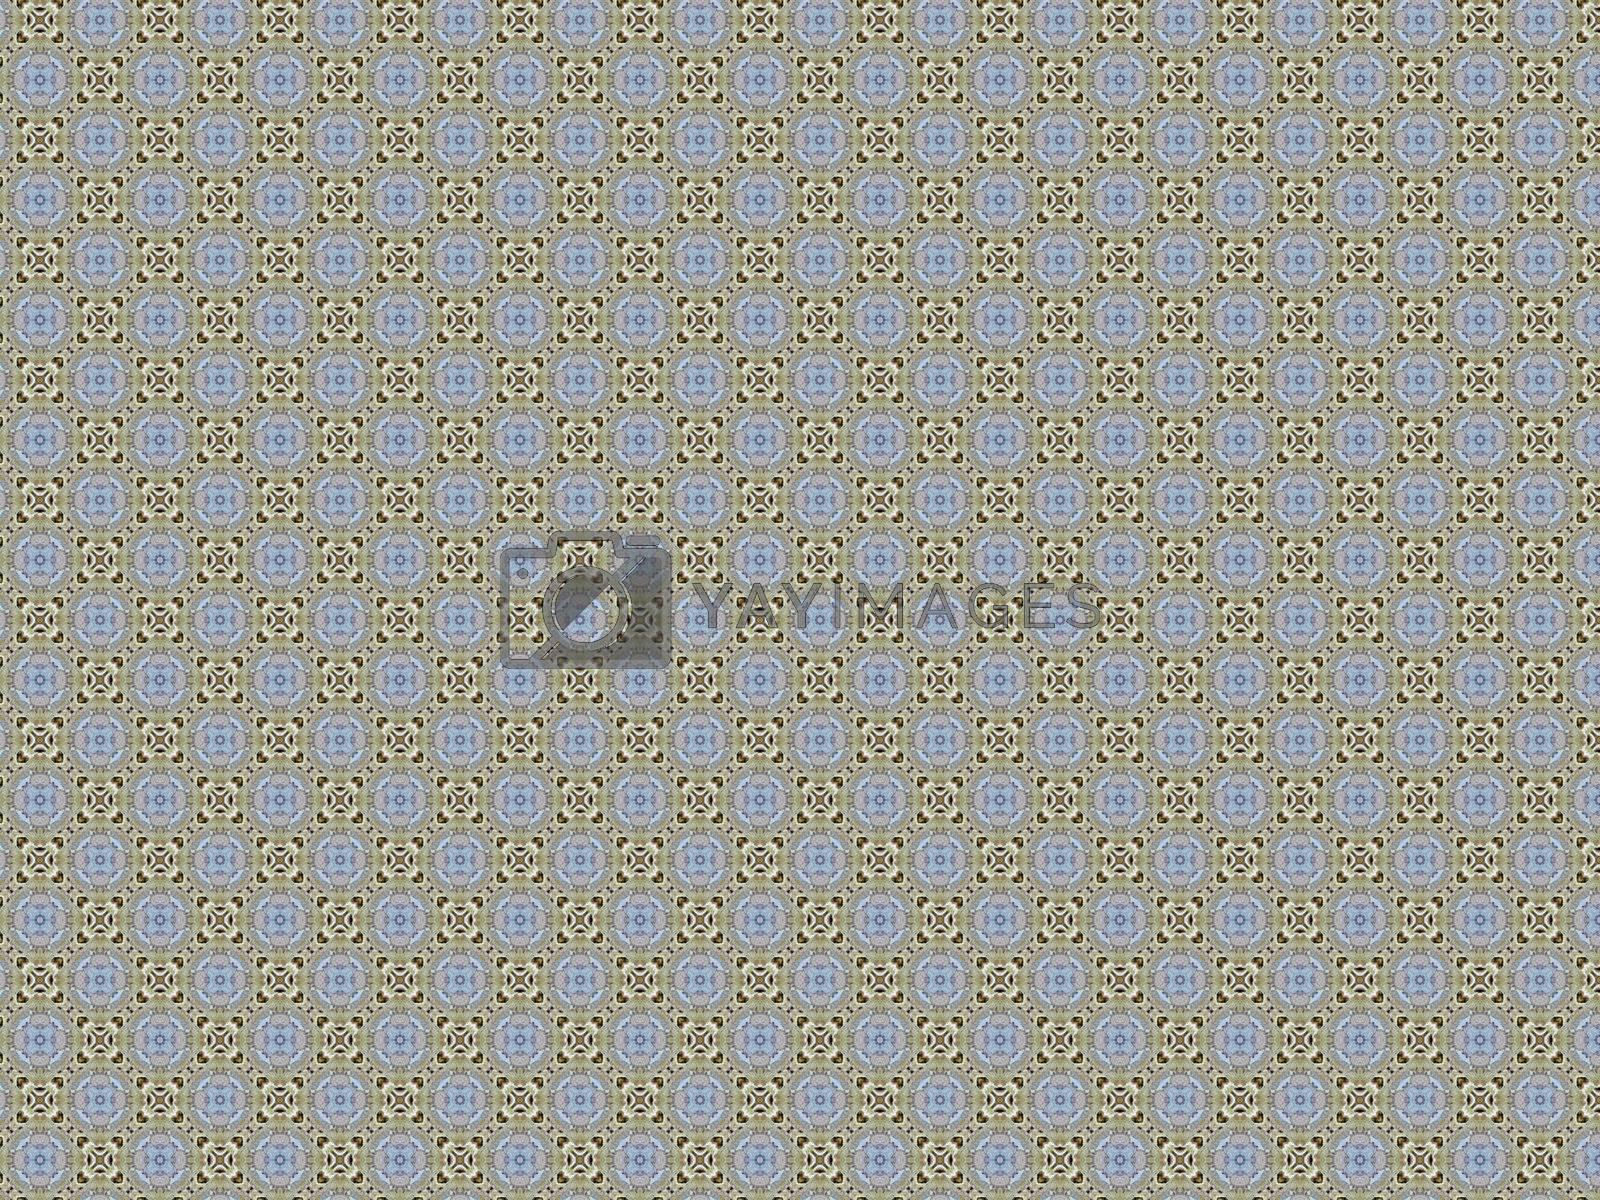 vintage shabby background with classy patterns. Retro Series by H2Oshka